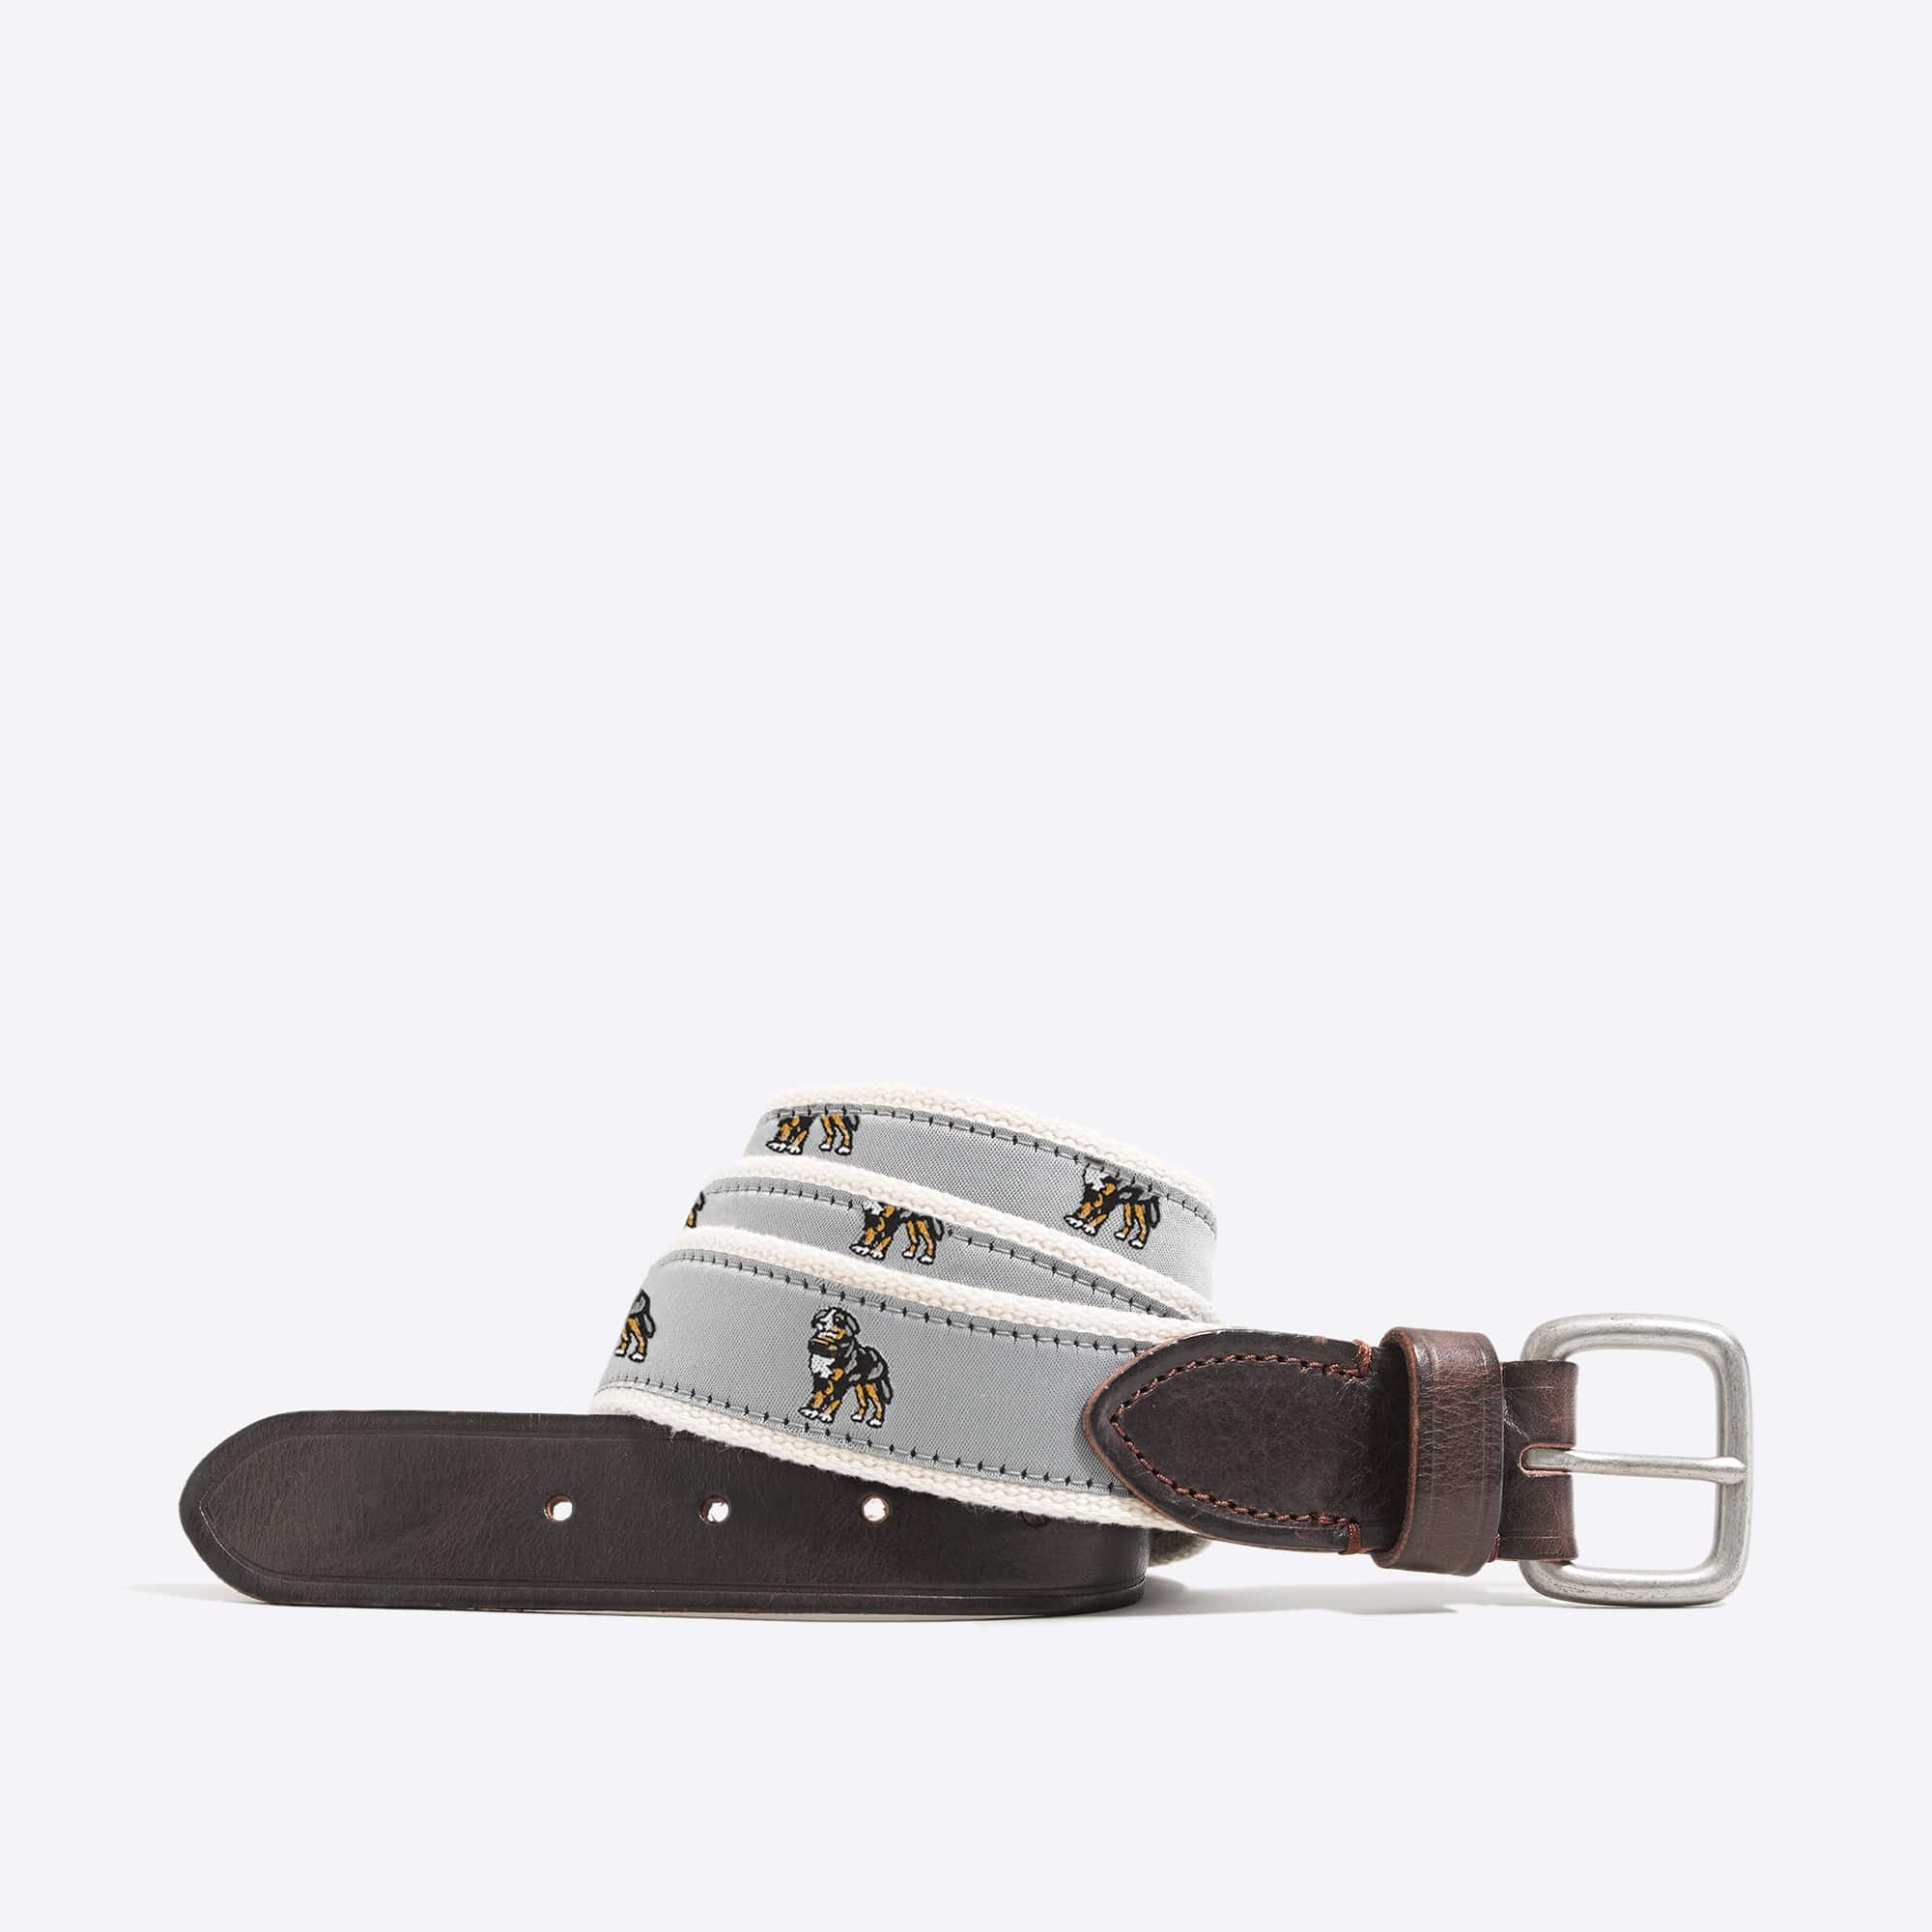 j crew sale belt